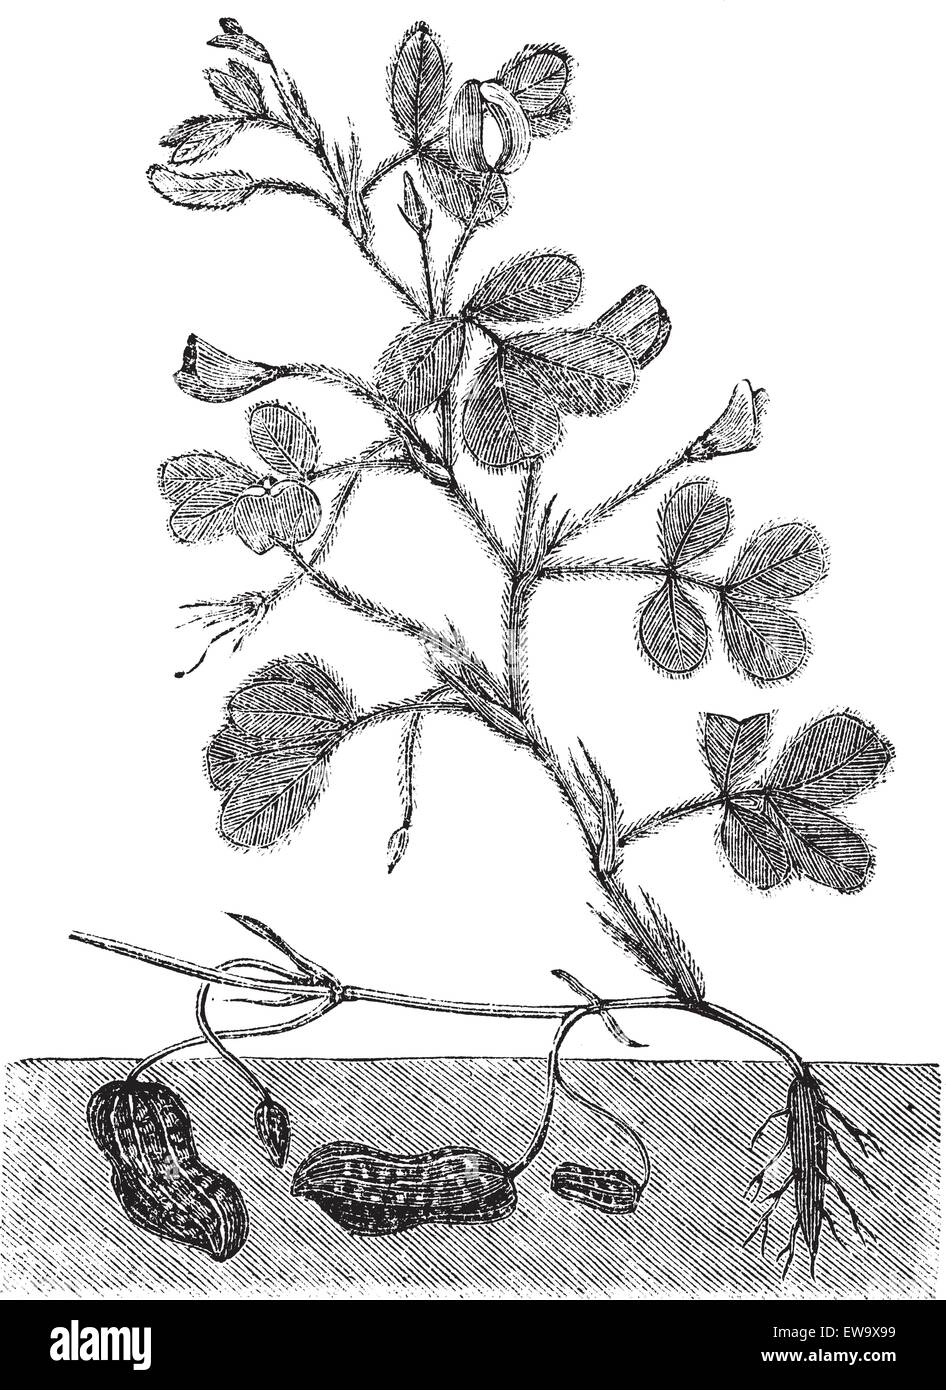 peanut or groundnut or arachis hypogea vintage engraving  old engraved  illustration of a peanut plant showing legumes underground